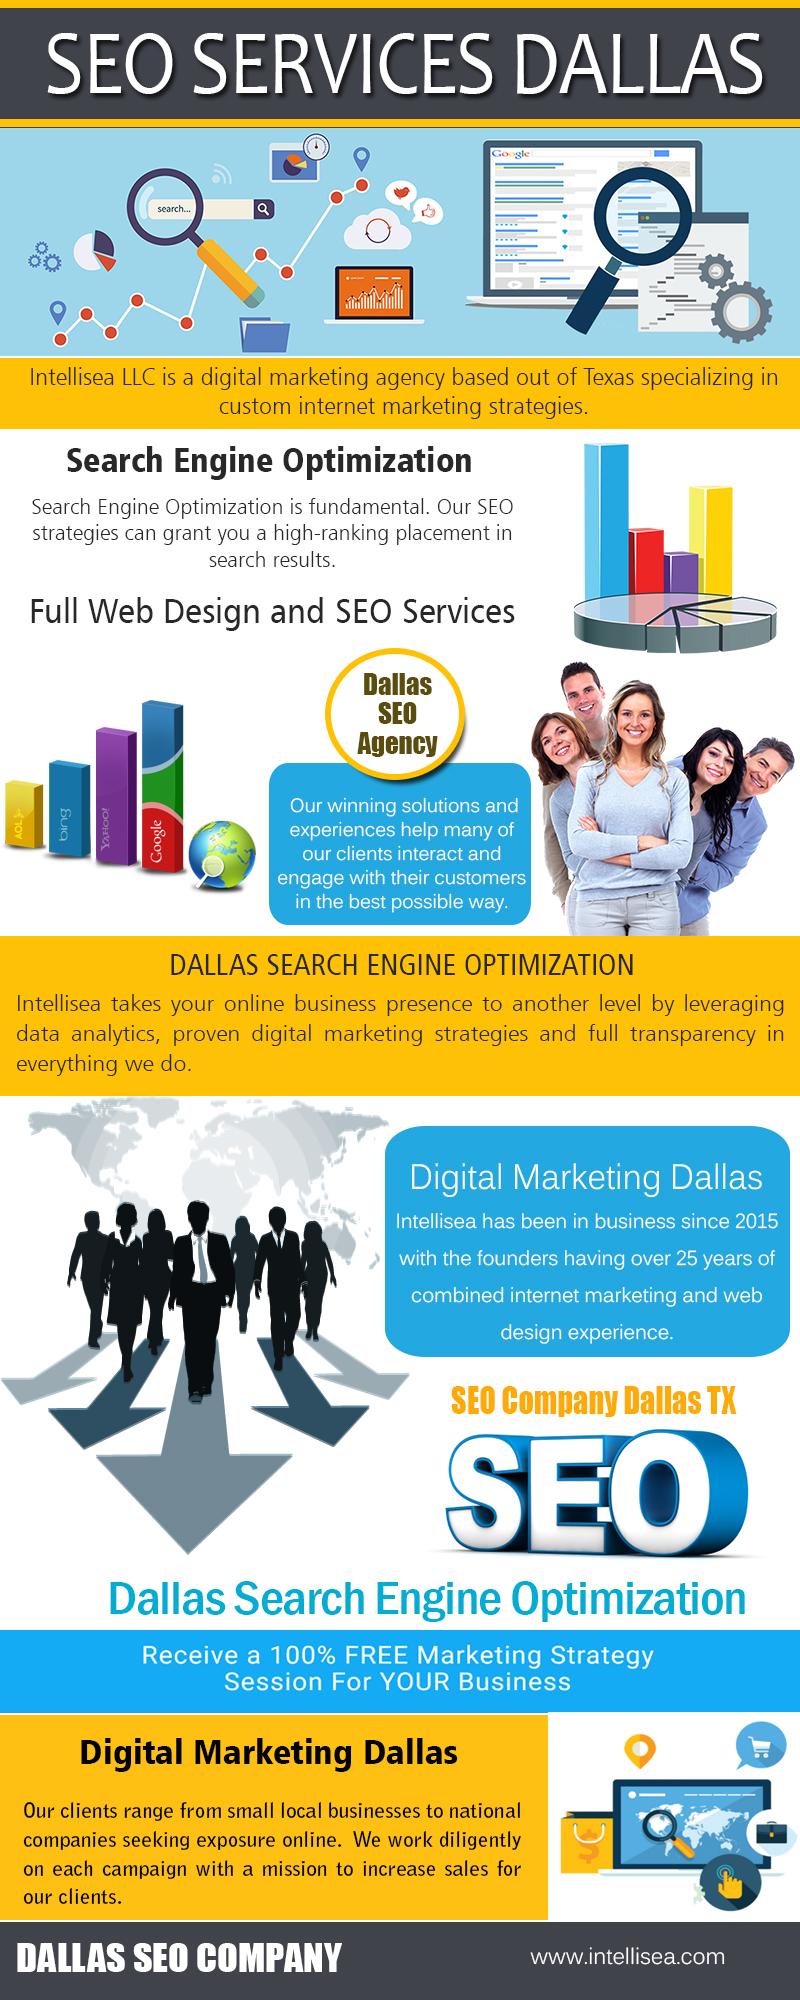 SEO Company Dallas | intellisea.com